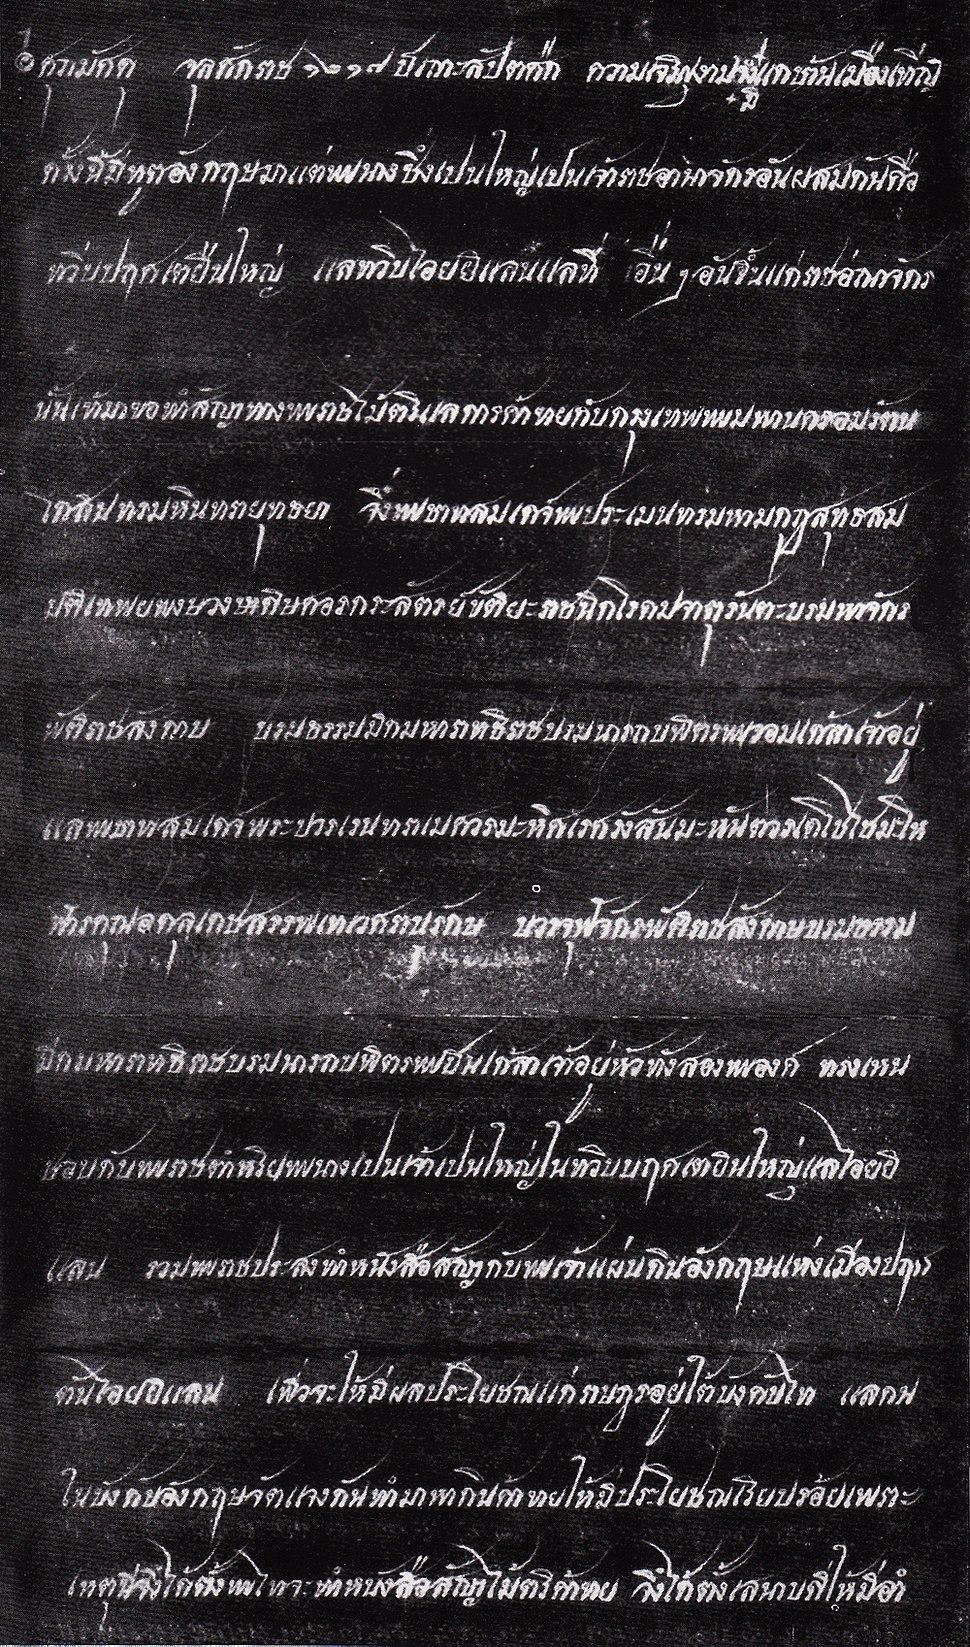 Bowring Treaty (TH Ver) 001